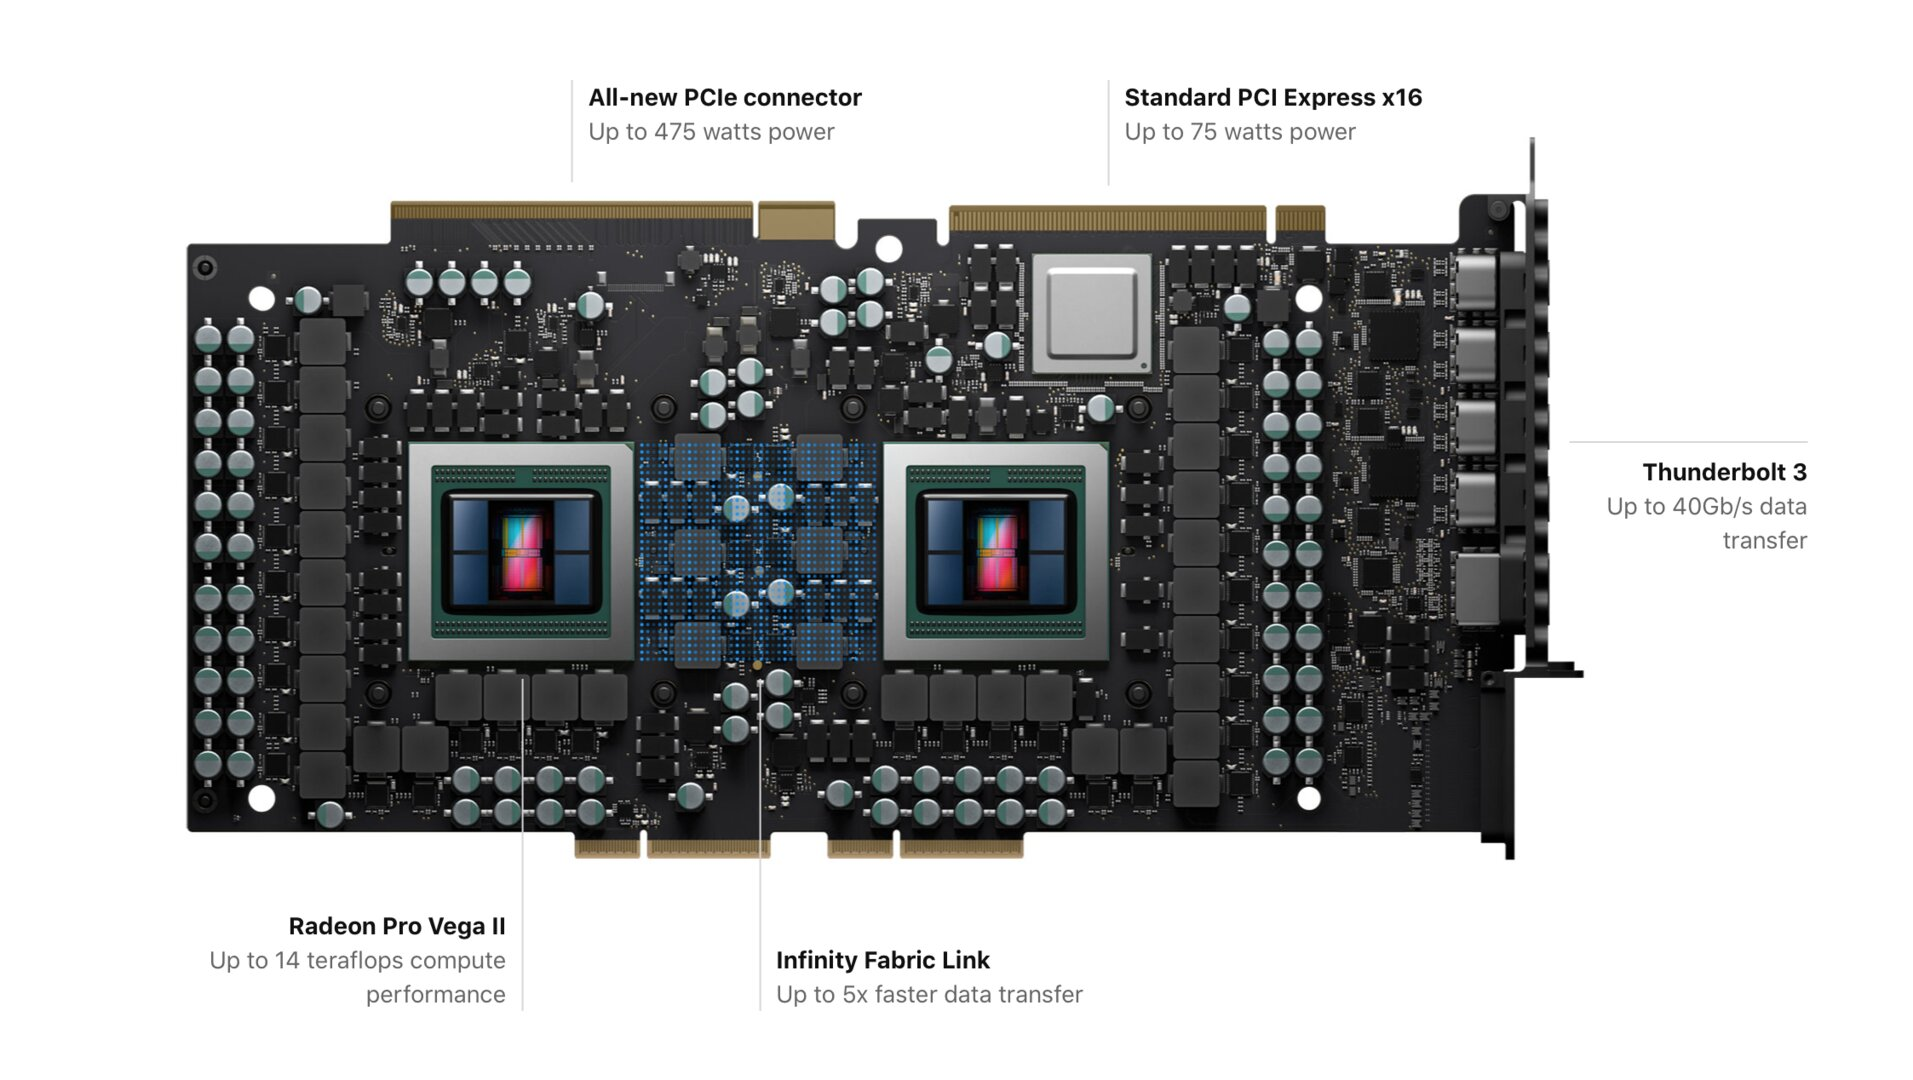 Das PCB der Dual-GPU-Grafikkarte mit 425 Watt Board Power